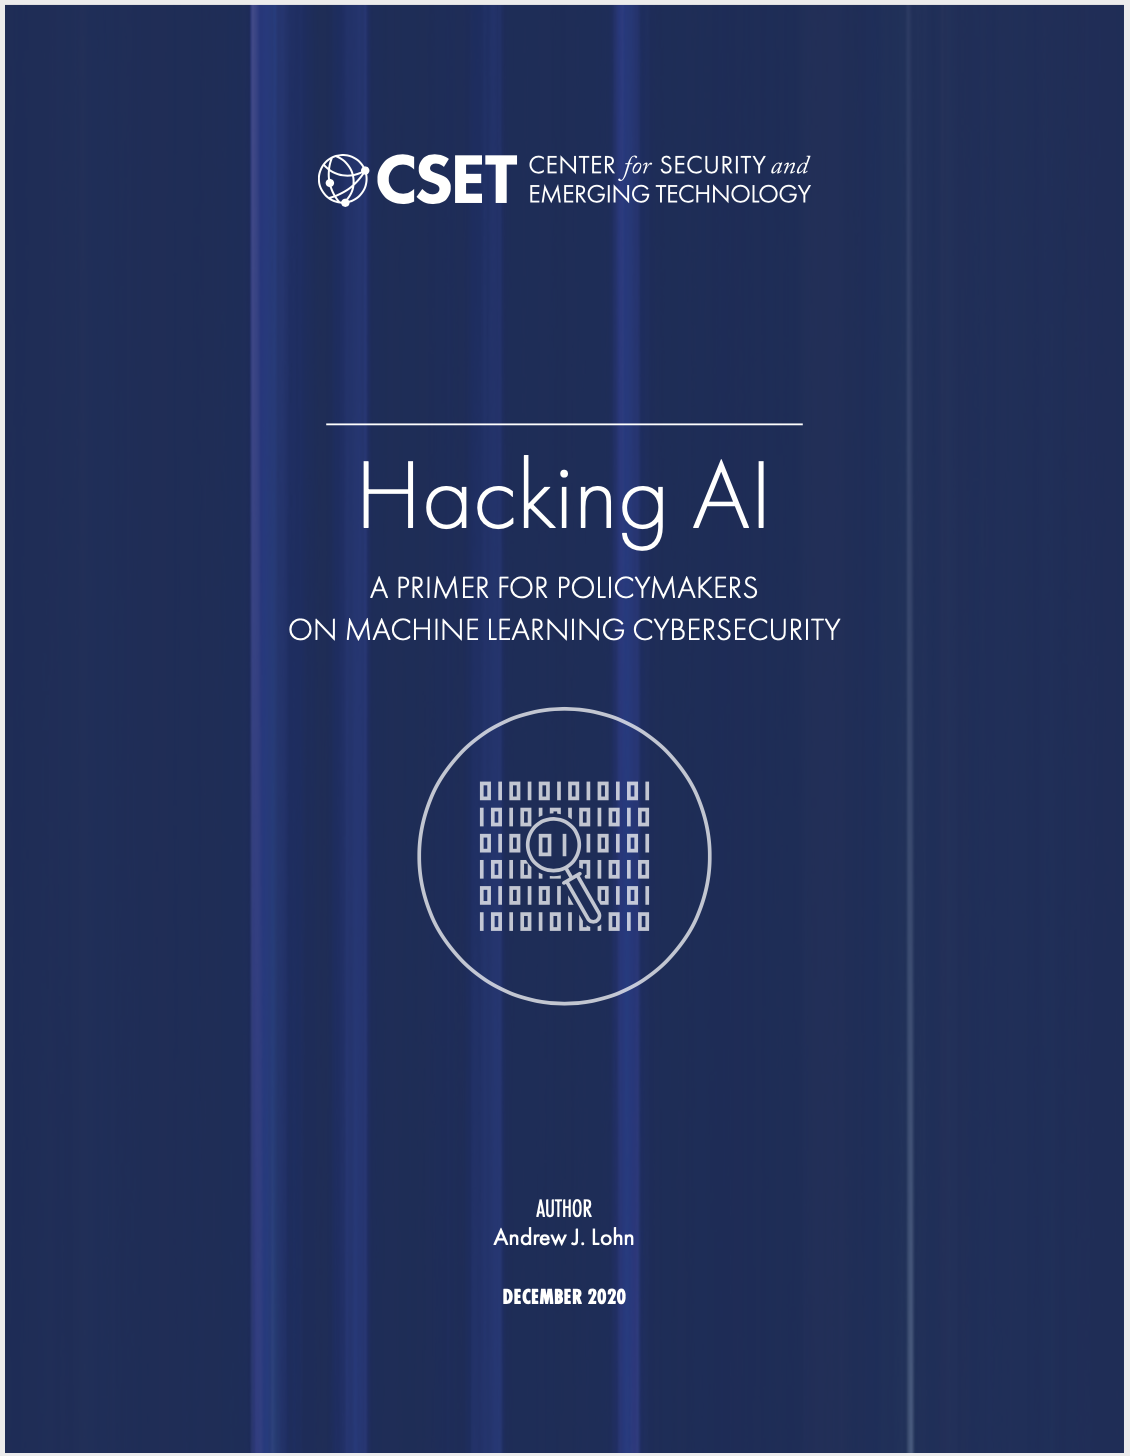 Hacking AI Image